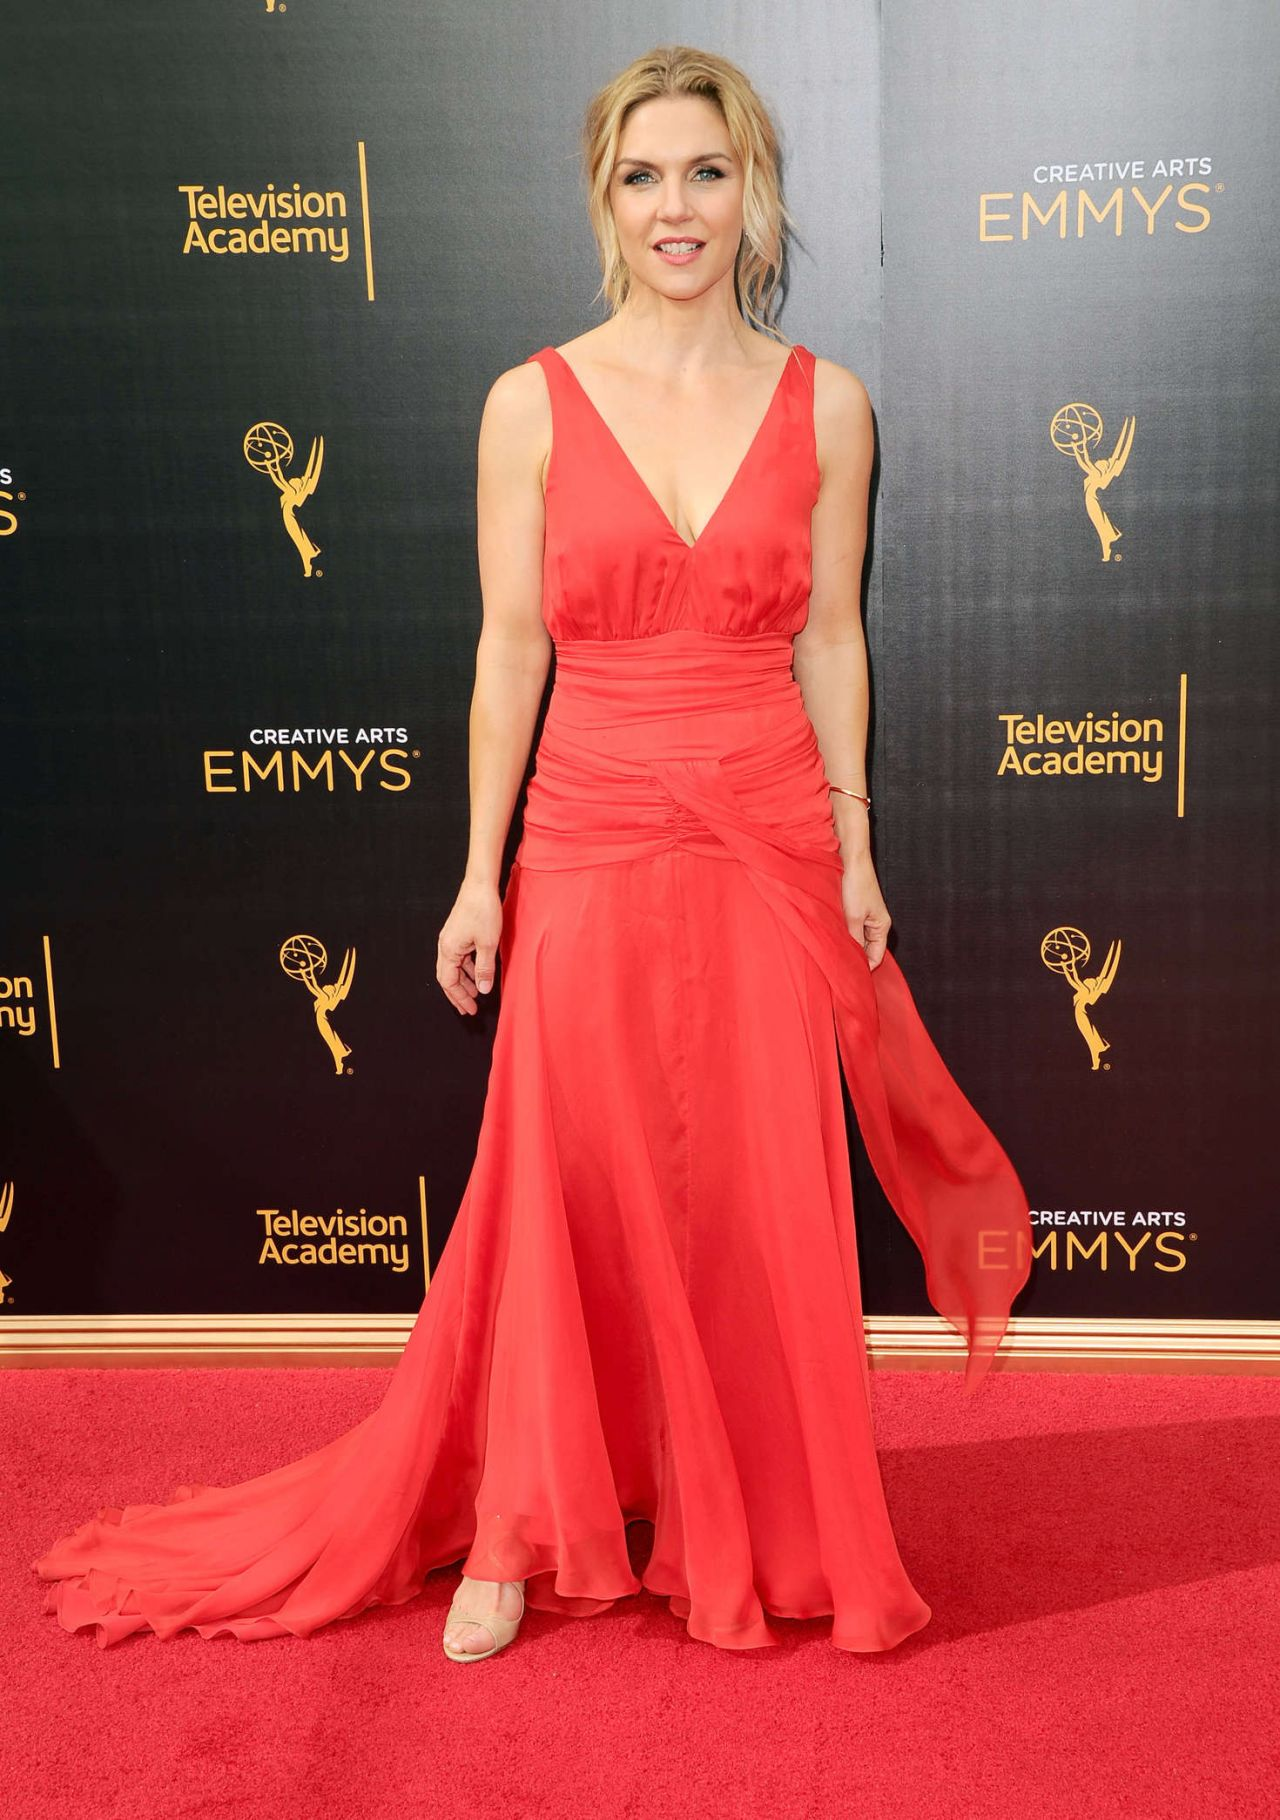 Rhea Seehorn  Creative Arts Emmy Awards 2016 in Los Angeles